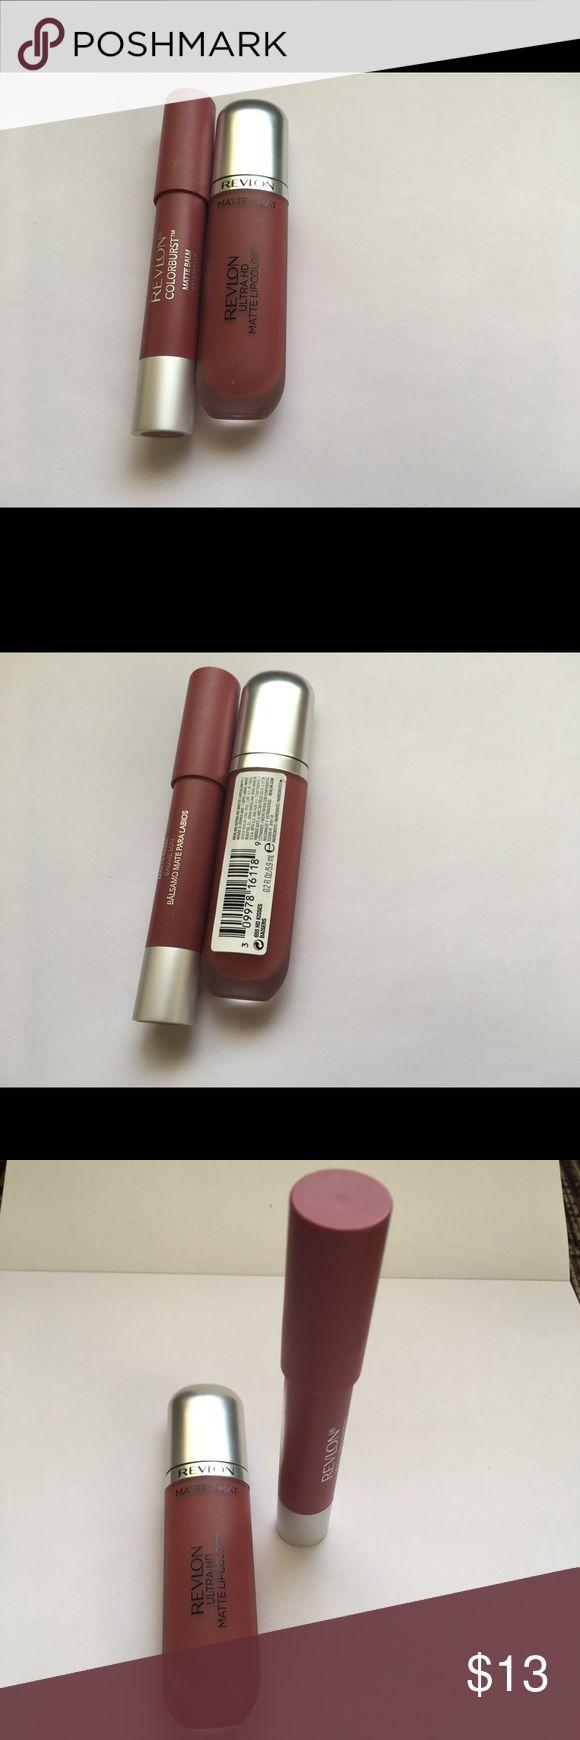 Revlon matte lipcolor and colorburst matte balm Lipcolor never used but I used mattebalm once time Revlon Makeup Lipstick